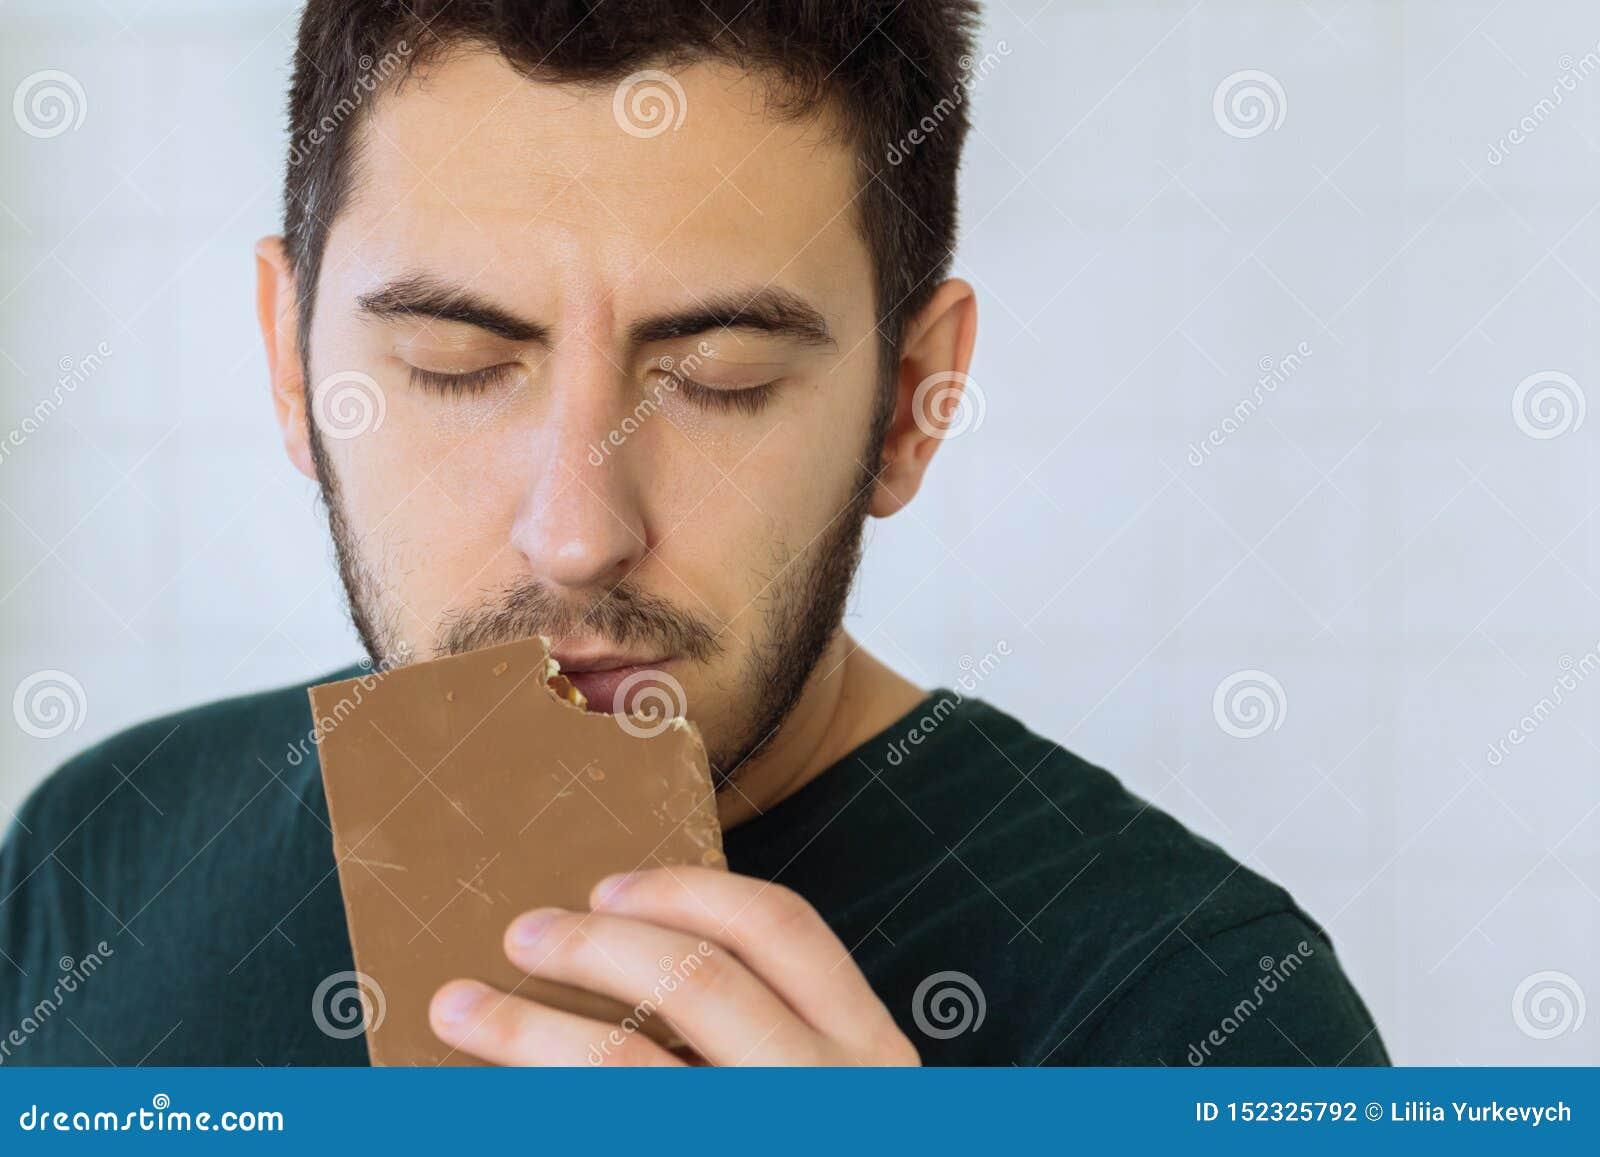 Man eats chocolate with great pleasure